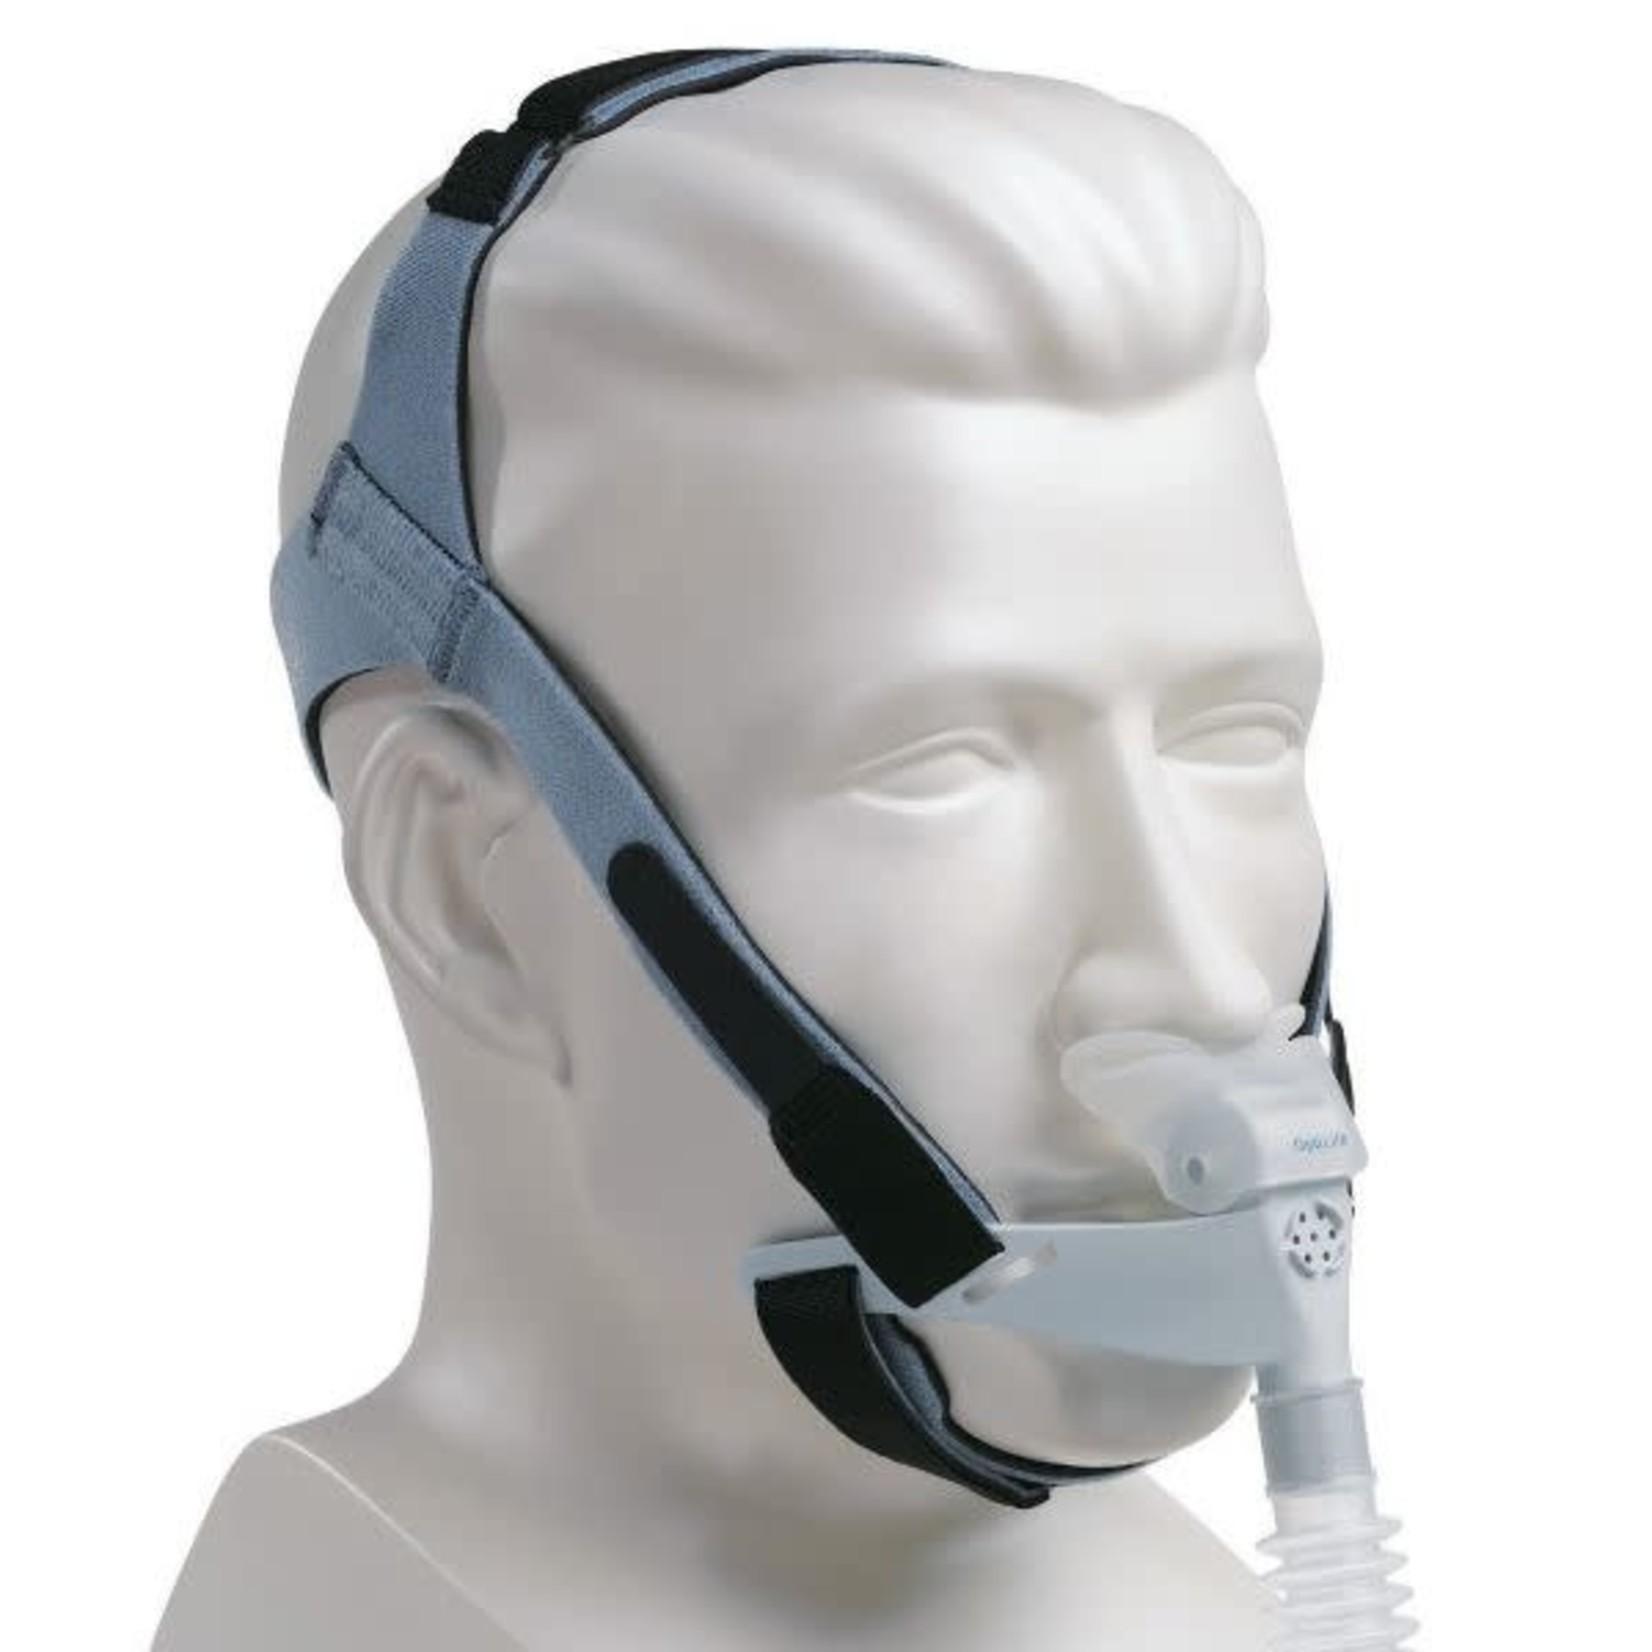 RESPIRONICS Optilife Nasal Pillow CPAP Mask w/Headgear